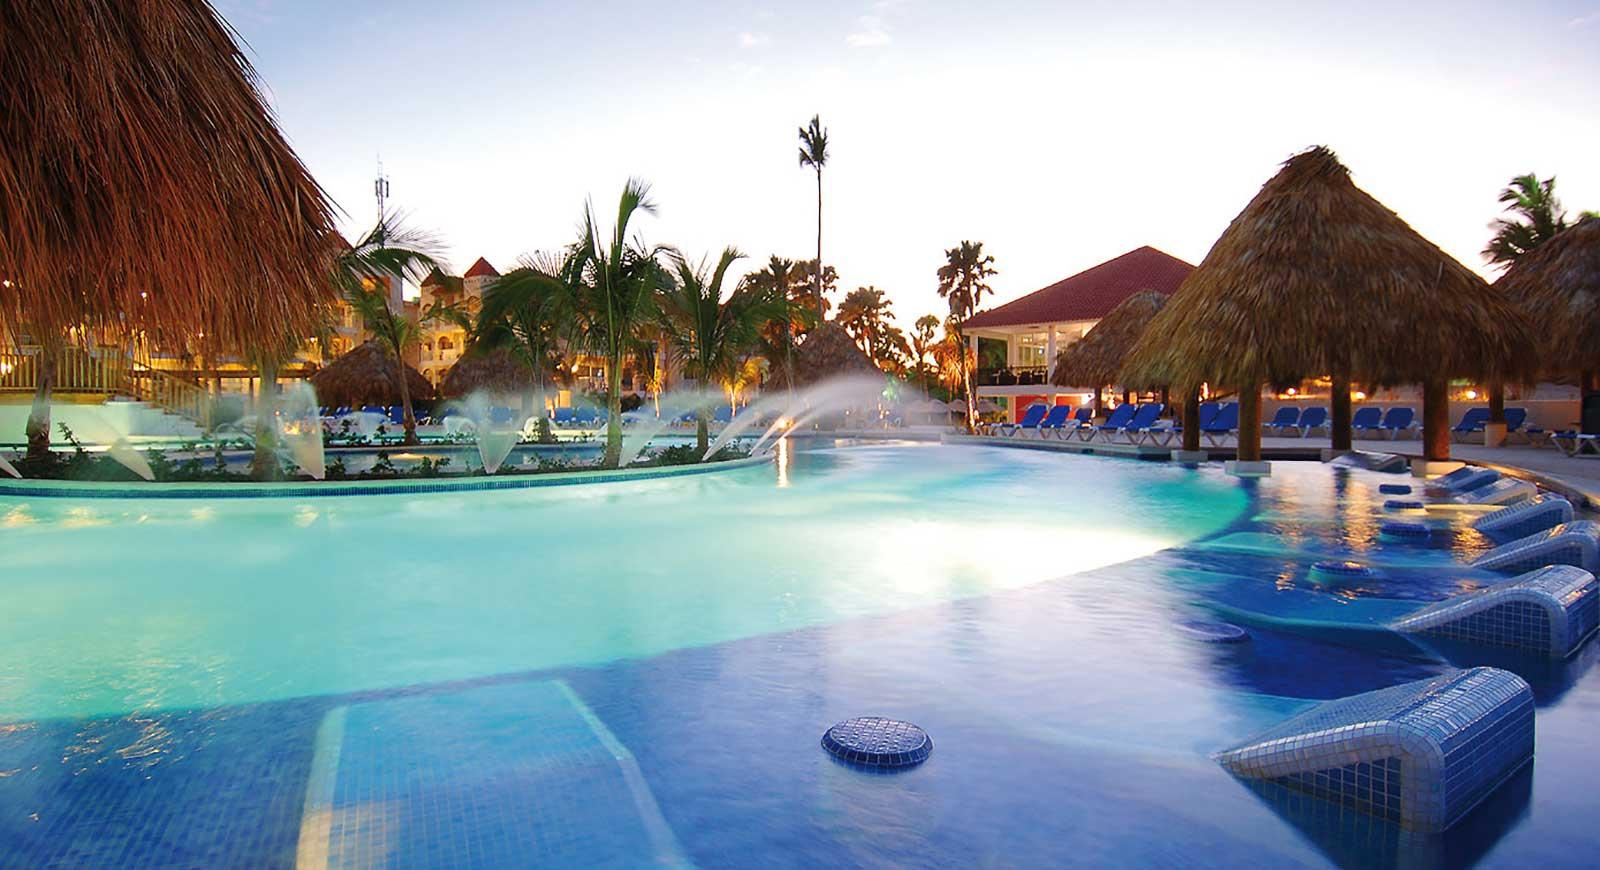 Barceló-Bávaro-Grand-Resort-Punta-Cana-República-Dominicana-1200-5